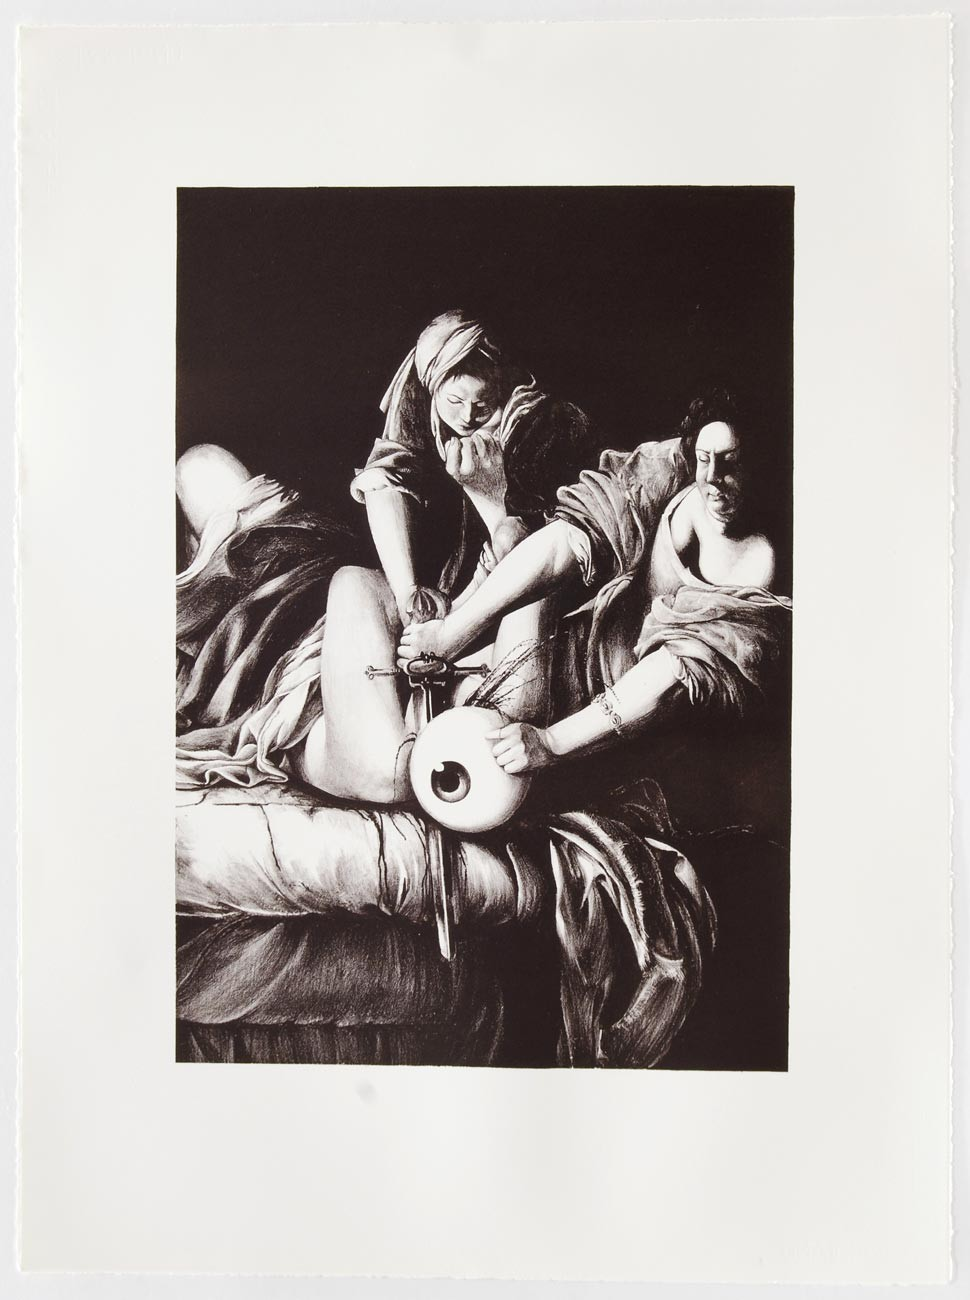 The Beheading - Jessica Harrison